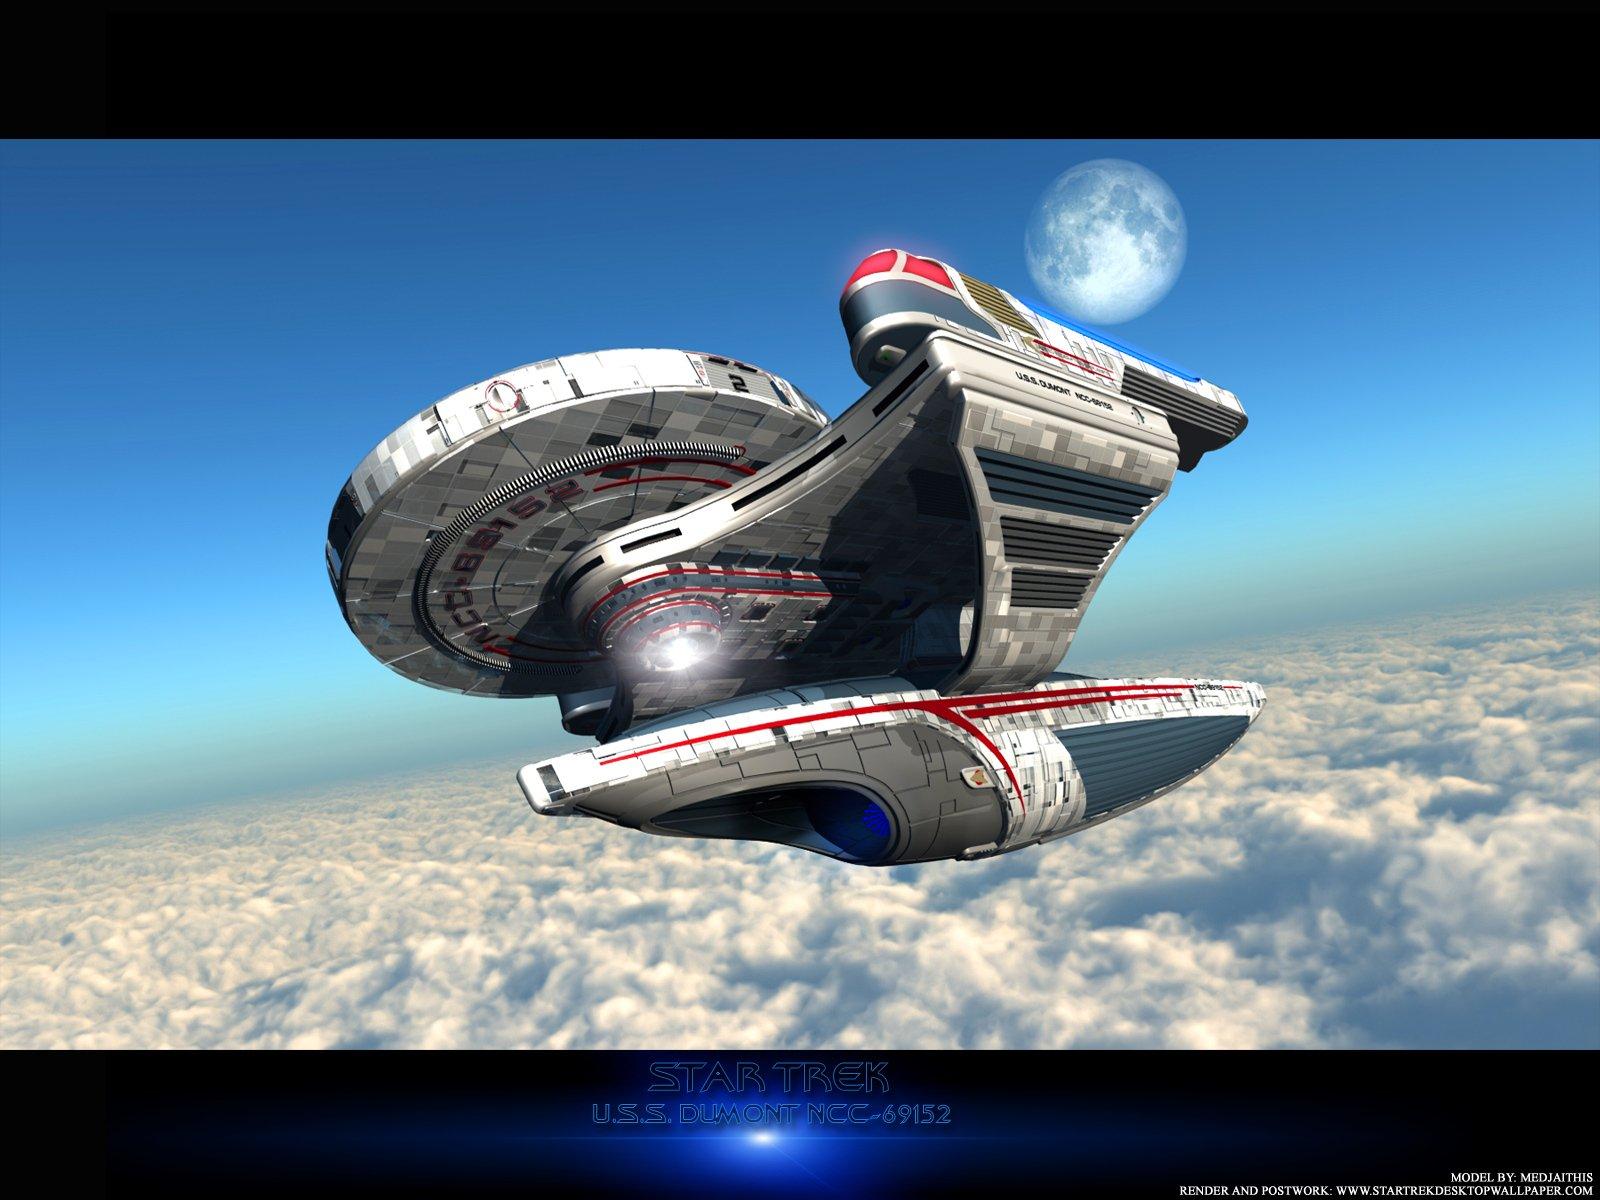 Star Trek Wallpaper and Background Image | 1600x1200 | ID ...